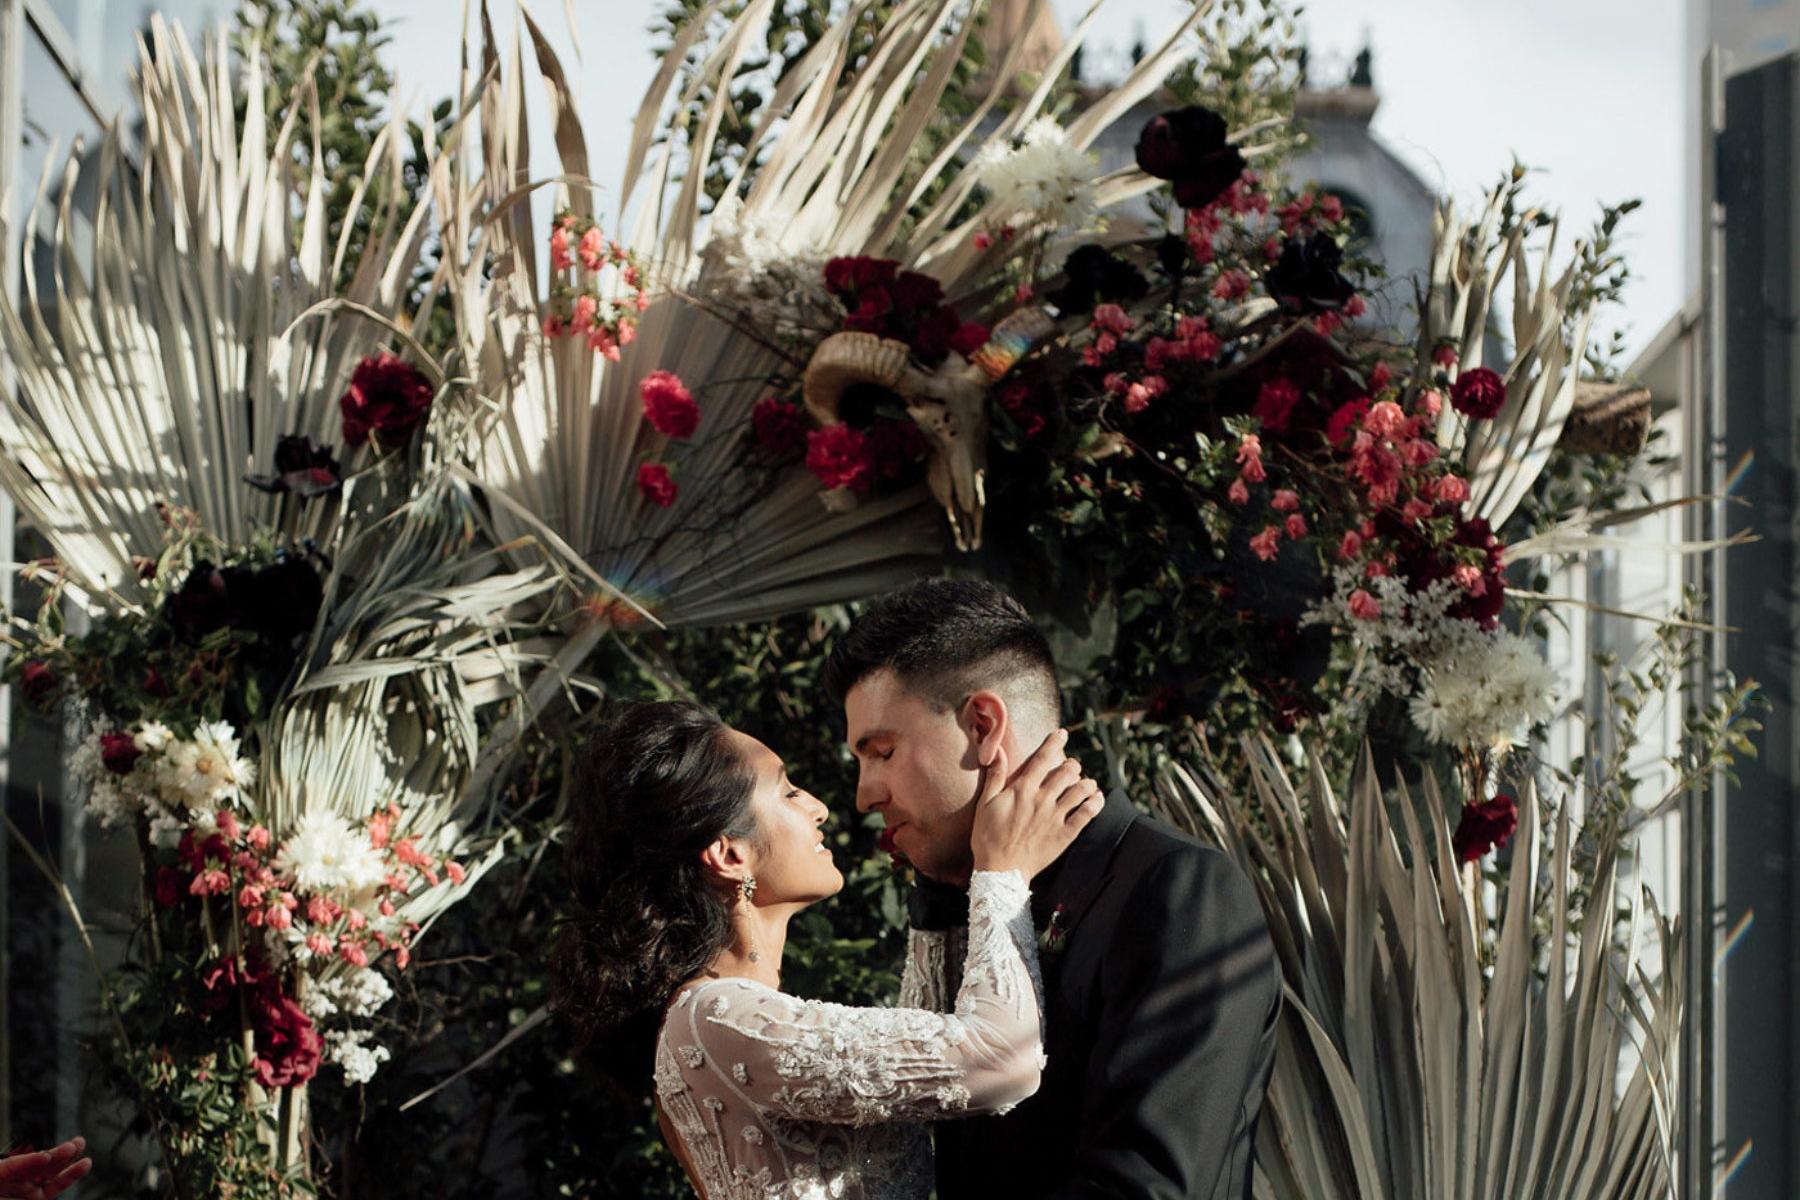 KALLISTA + SAM - WEDDING VENUE: ALTO Event Space